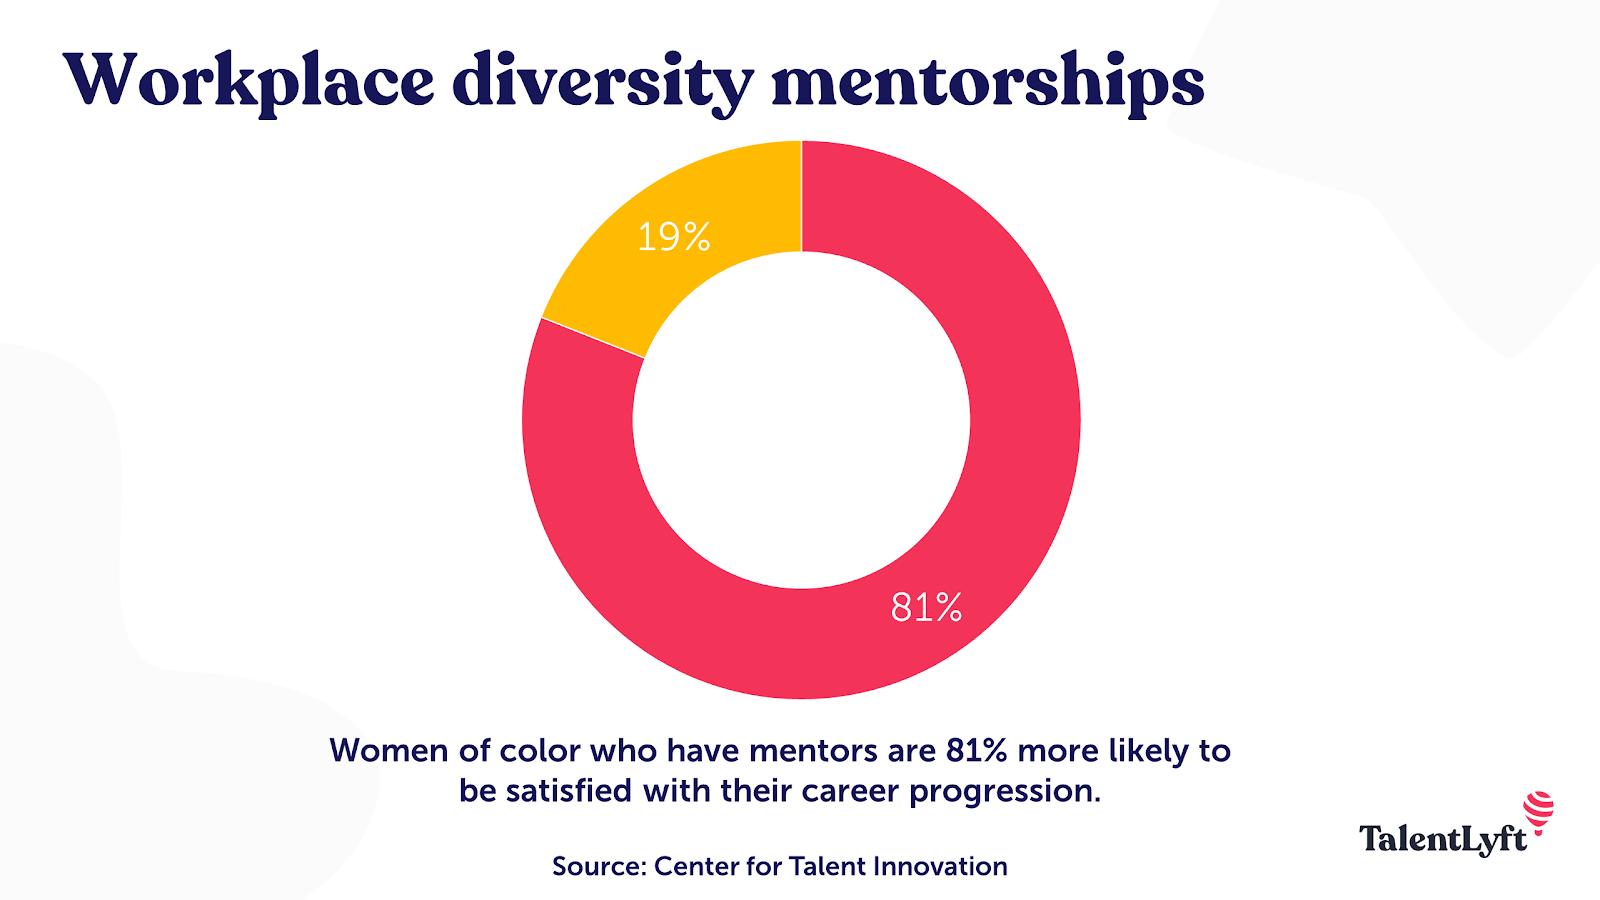 Workplace diversity mentorship